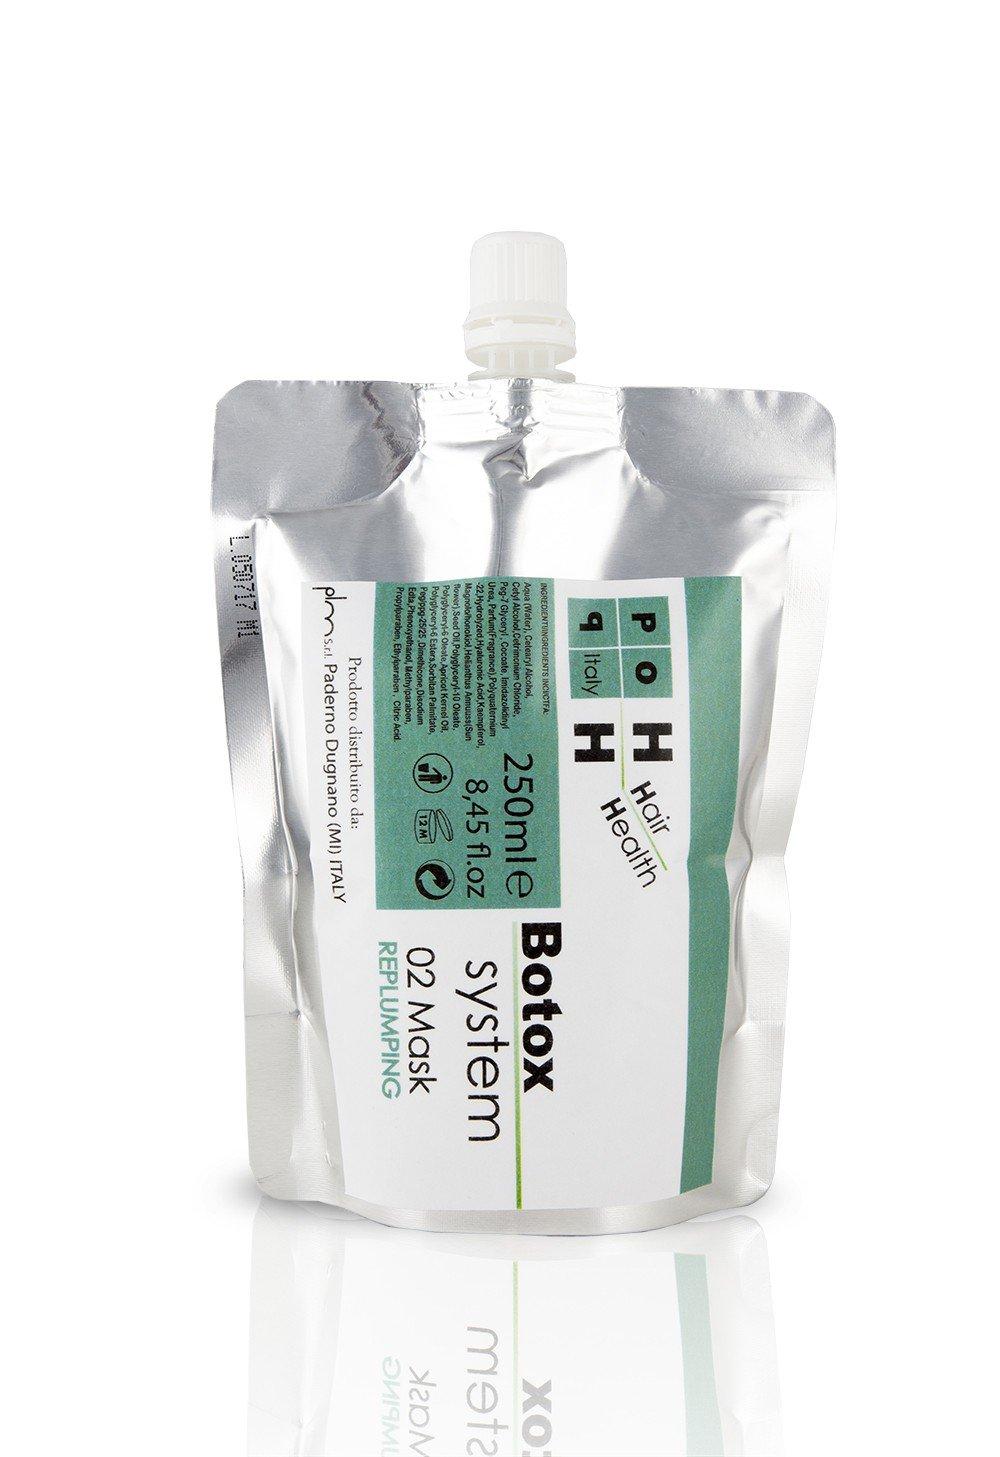 Pop Italy Botox System Replumping - Maschera al Botox per i capelli, 250 ml BOTOXMASK02